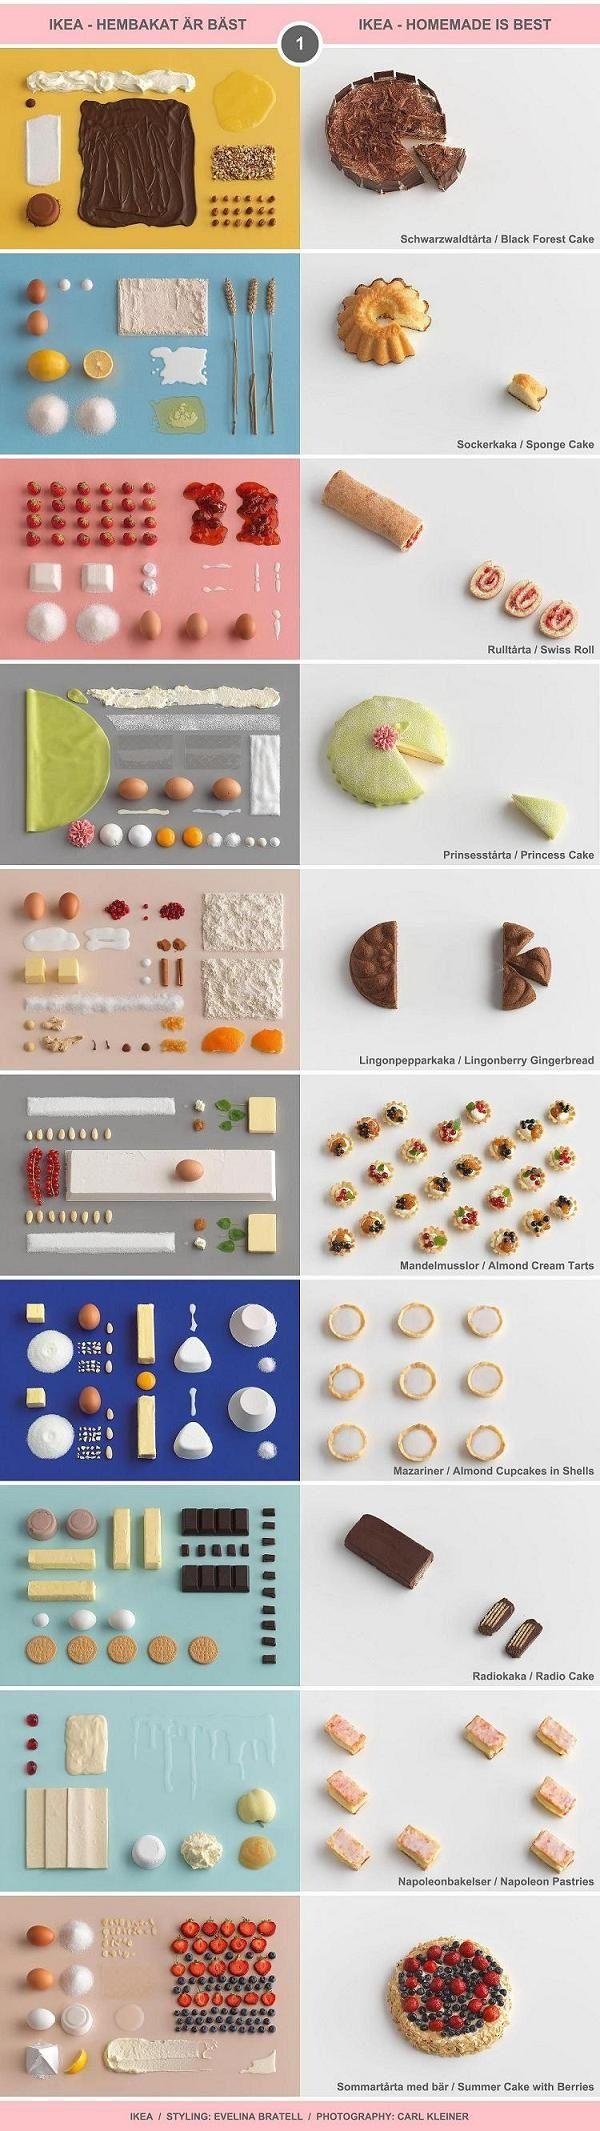 "10 Classic Swedish Treats (I) – IKEA cookbook ""Hembakat är Bäst"" (Homemade Is Best) / Food Styling by Evelina Bratell, Photos by Carl Kleiner (www.carlkleiner.com)"